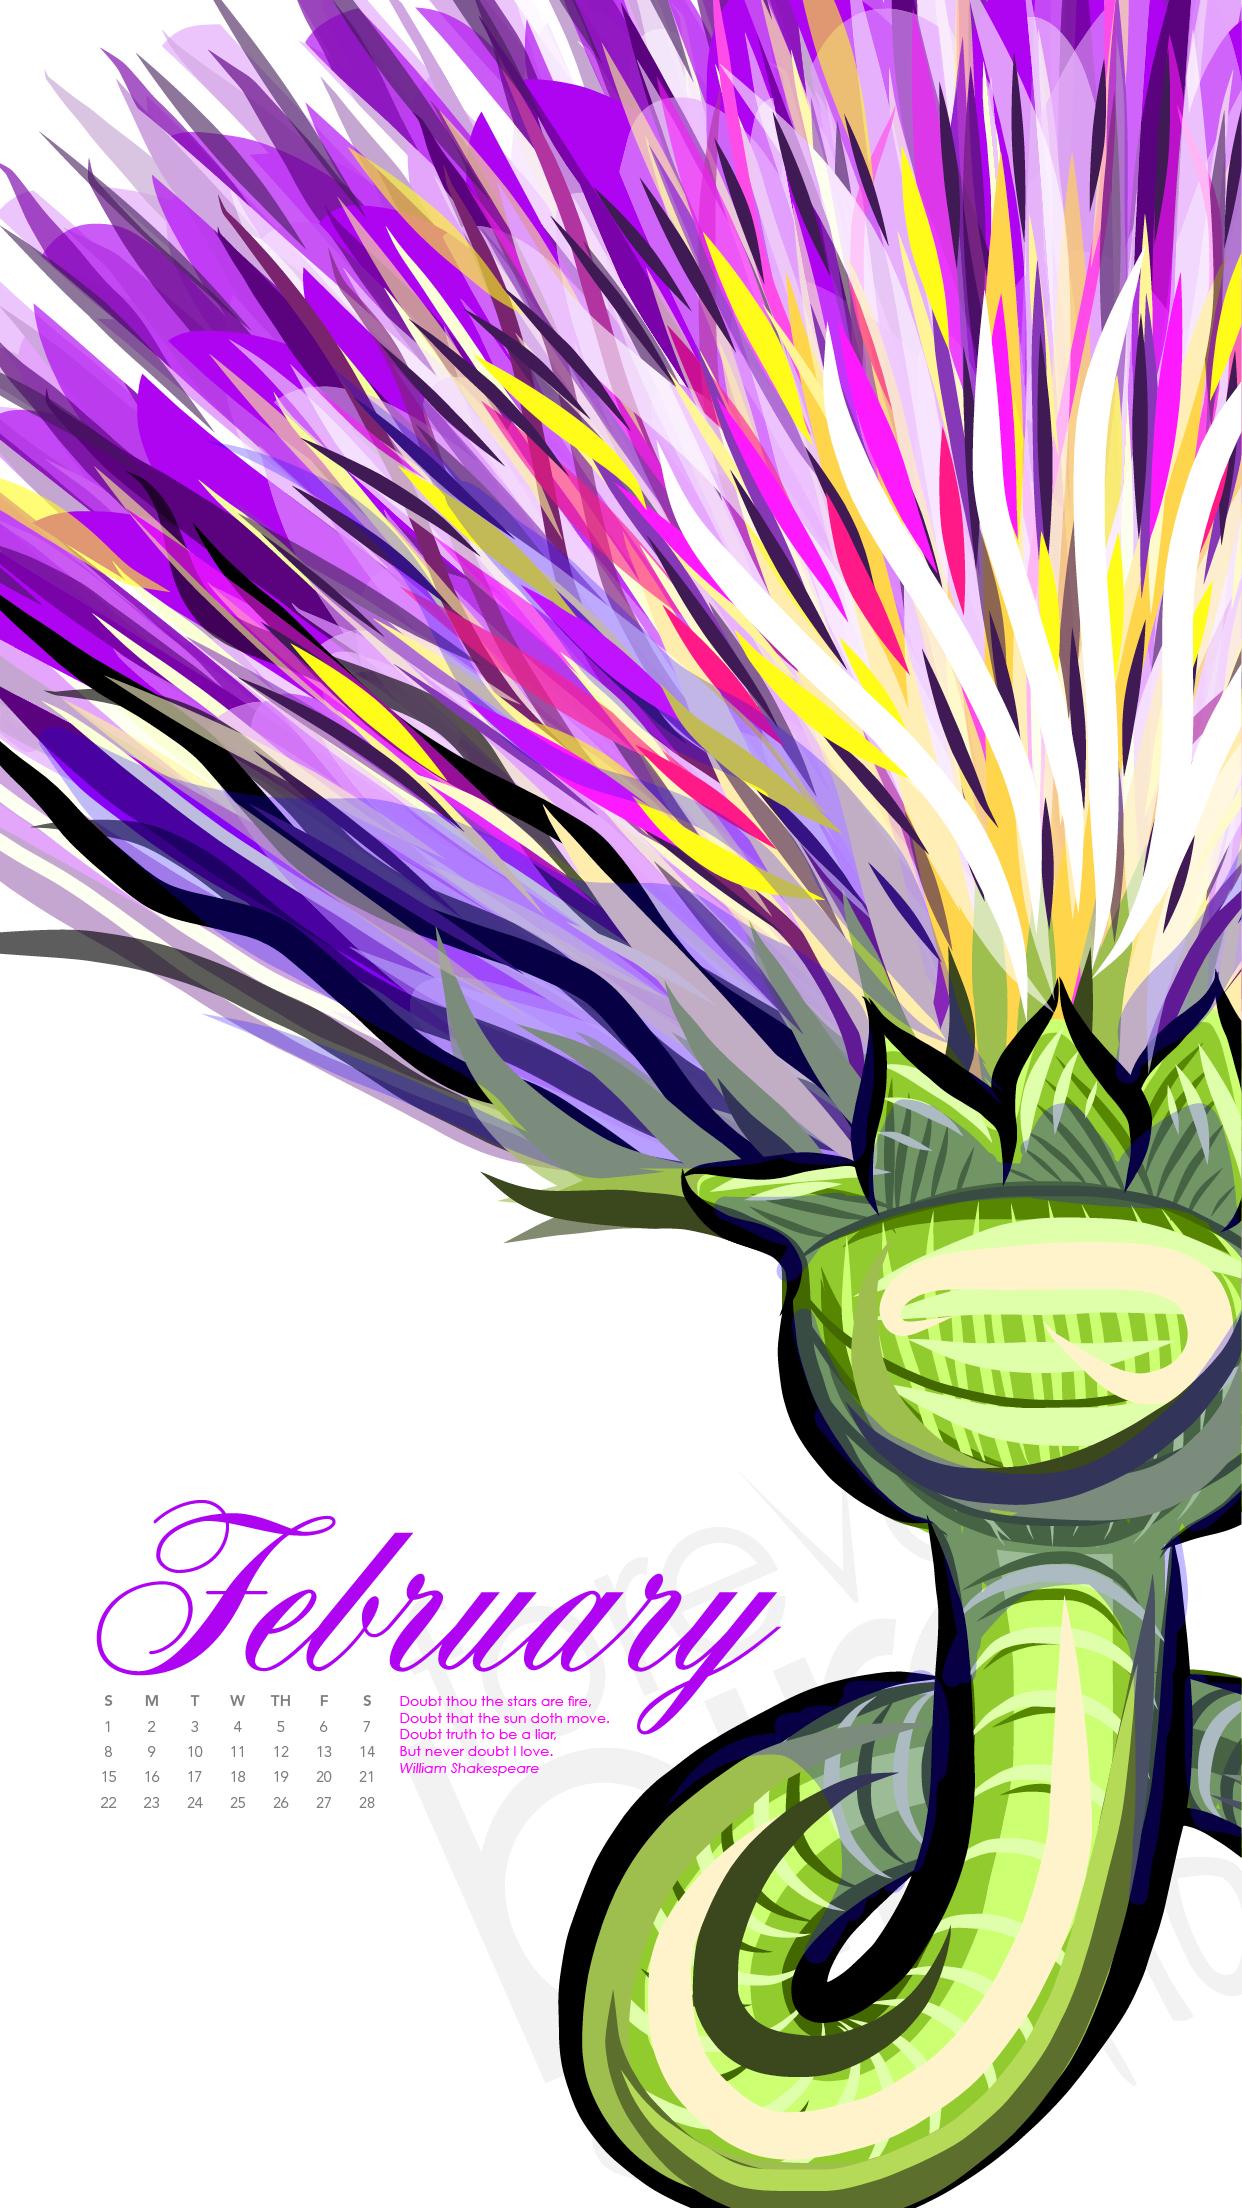 MitraCline Feb2015 Calendar22 1242x2208